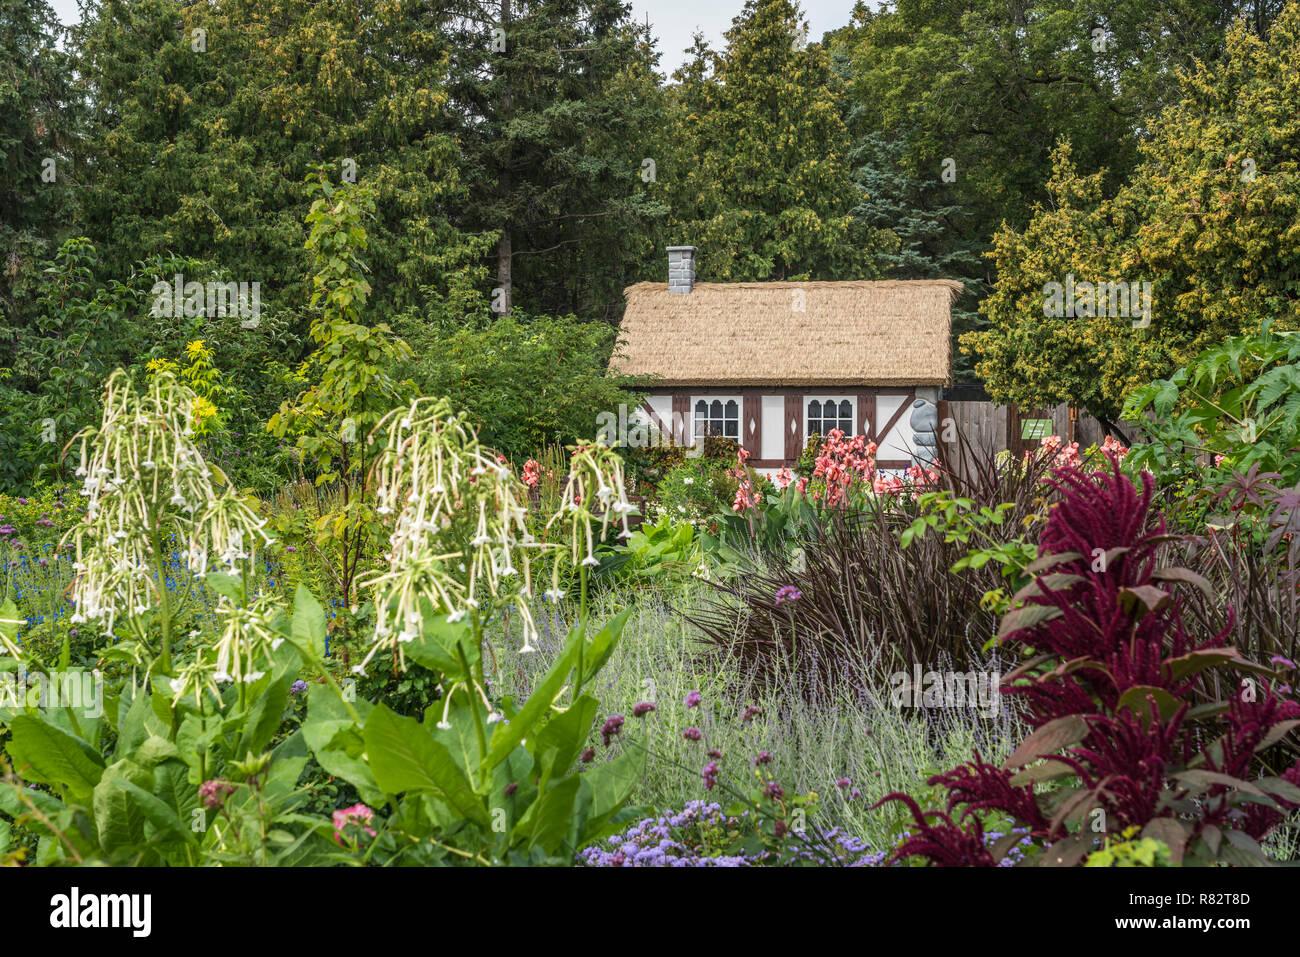 The English Gardens at the Assiniboine Park, Winnipeg, Manitoba, Canada. - Stock Image